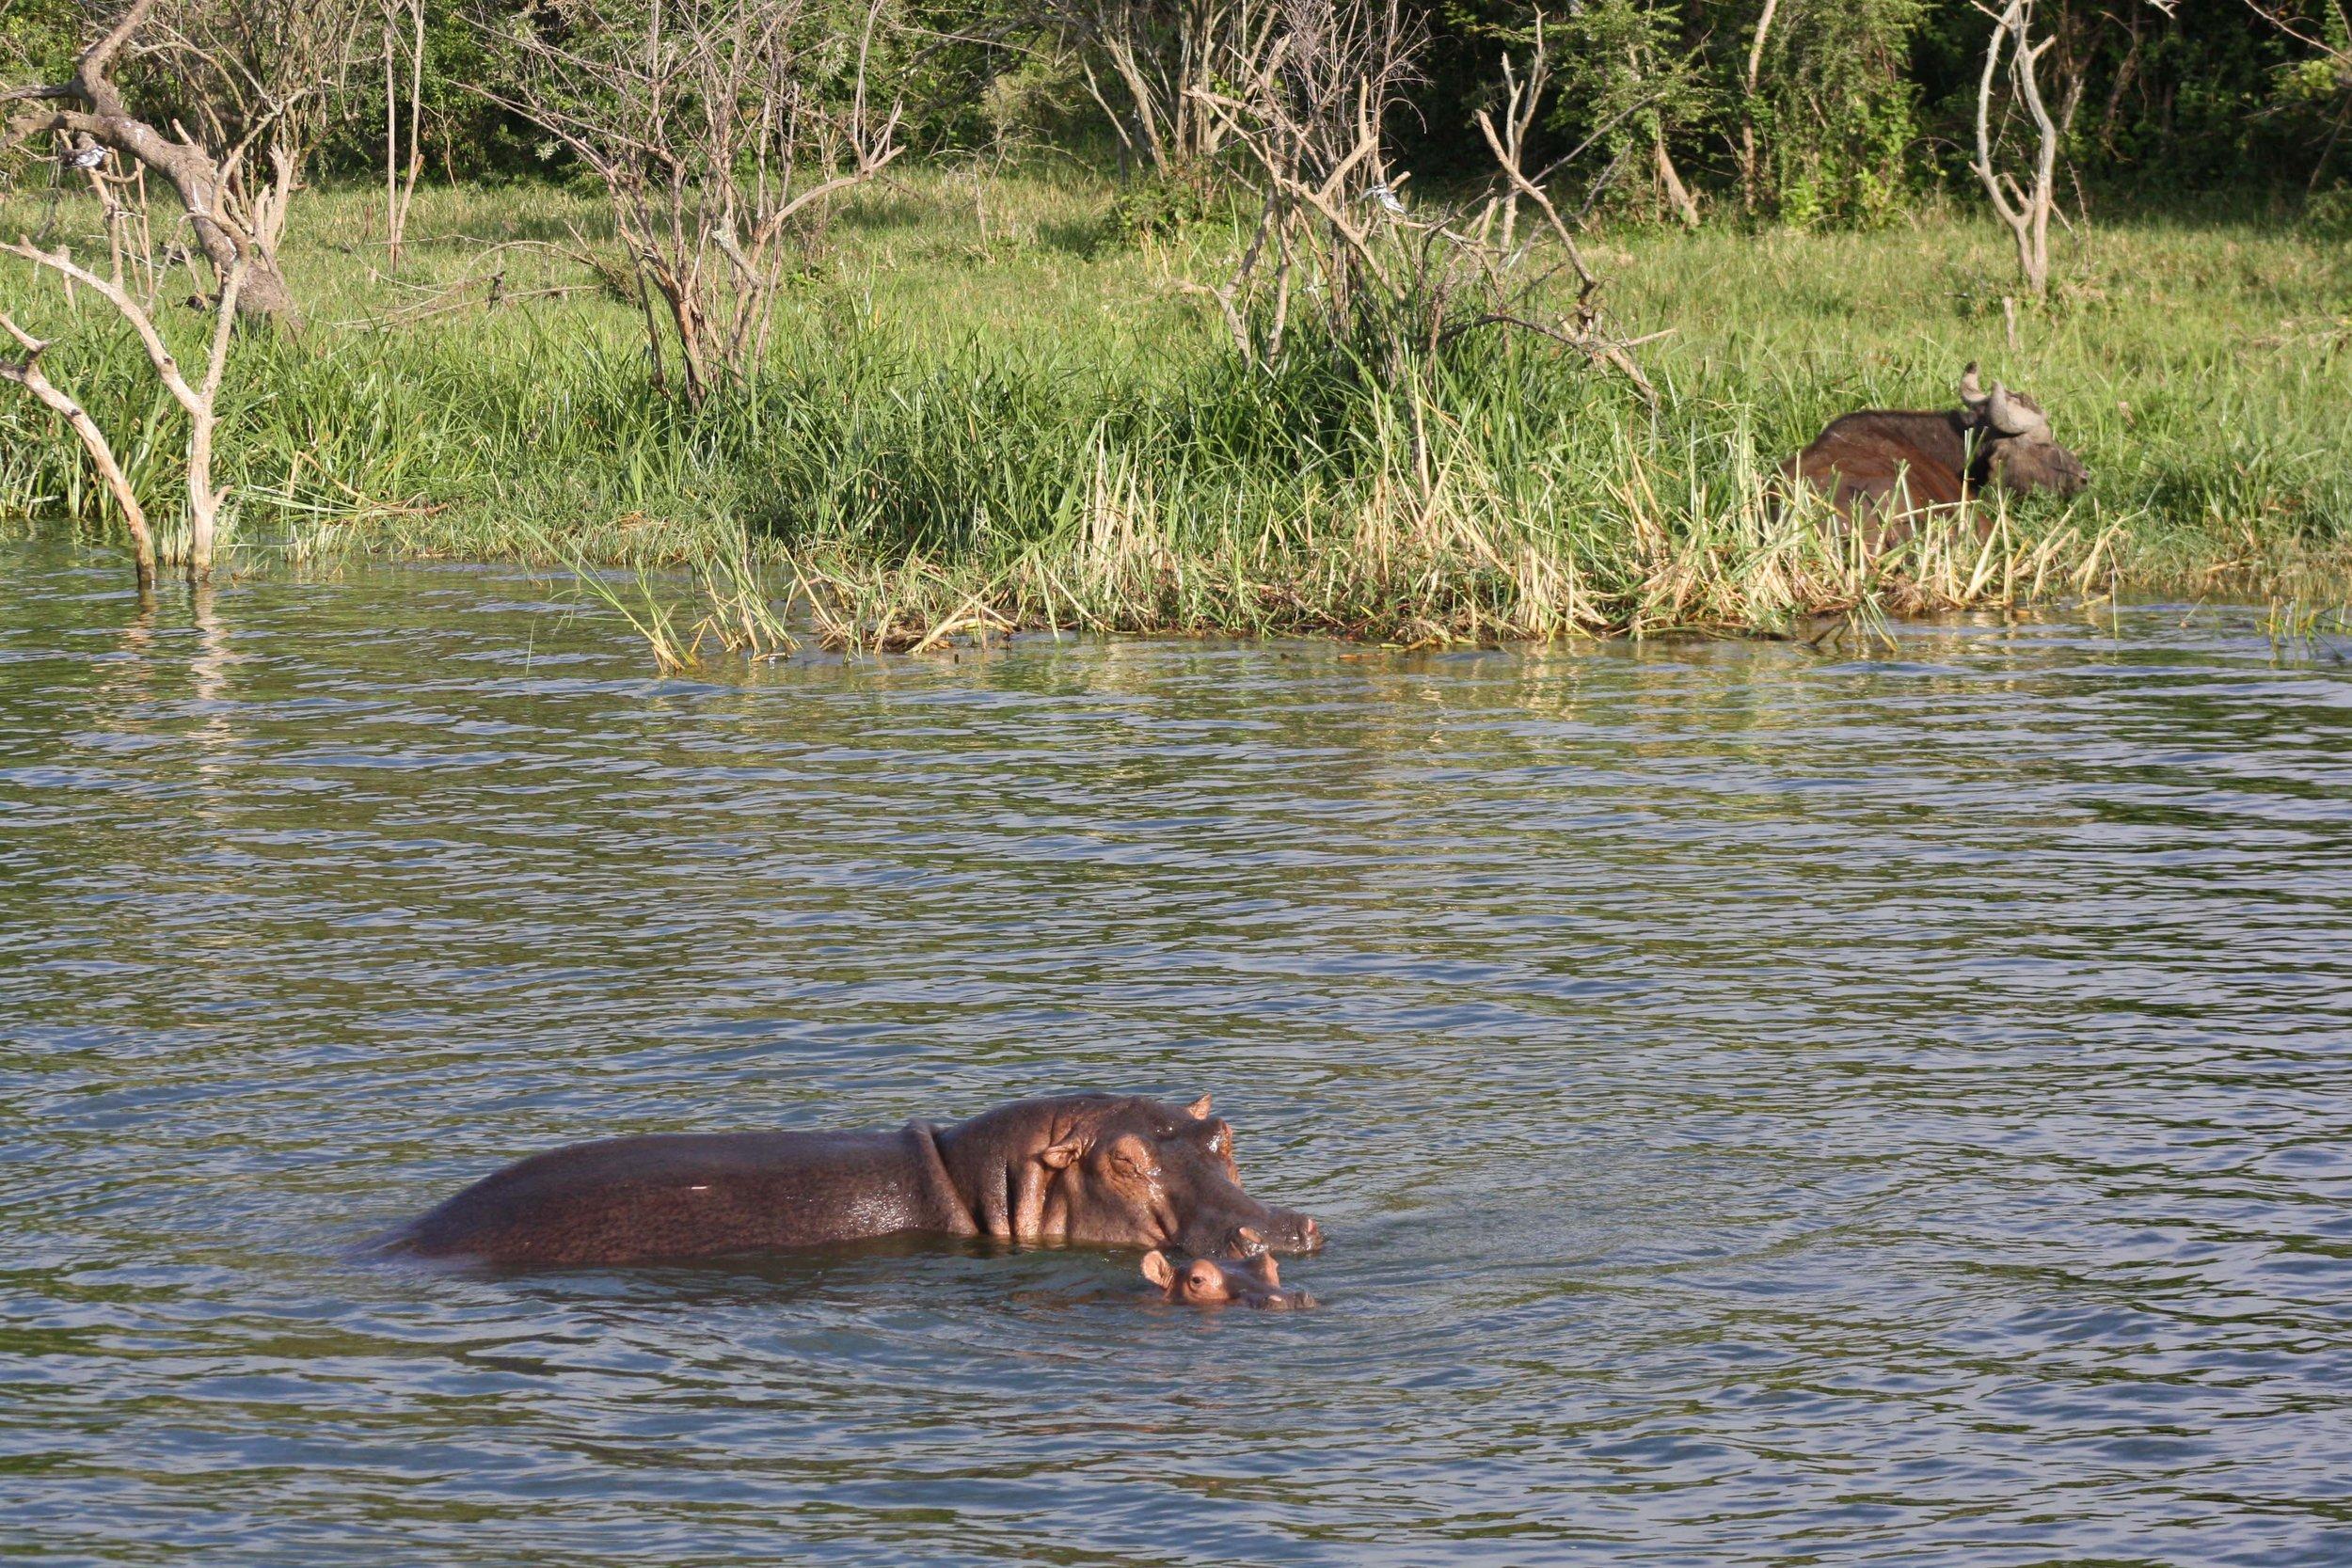 I saw loads of hippos in Queen Elizabeth National Park in Uganda © Sarah Reid